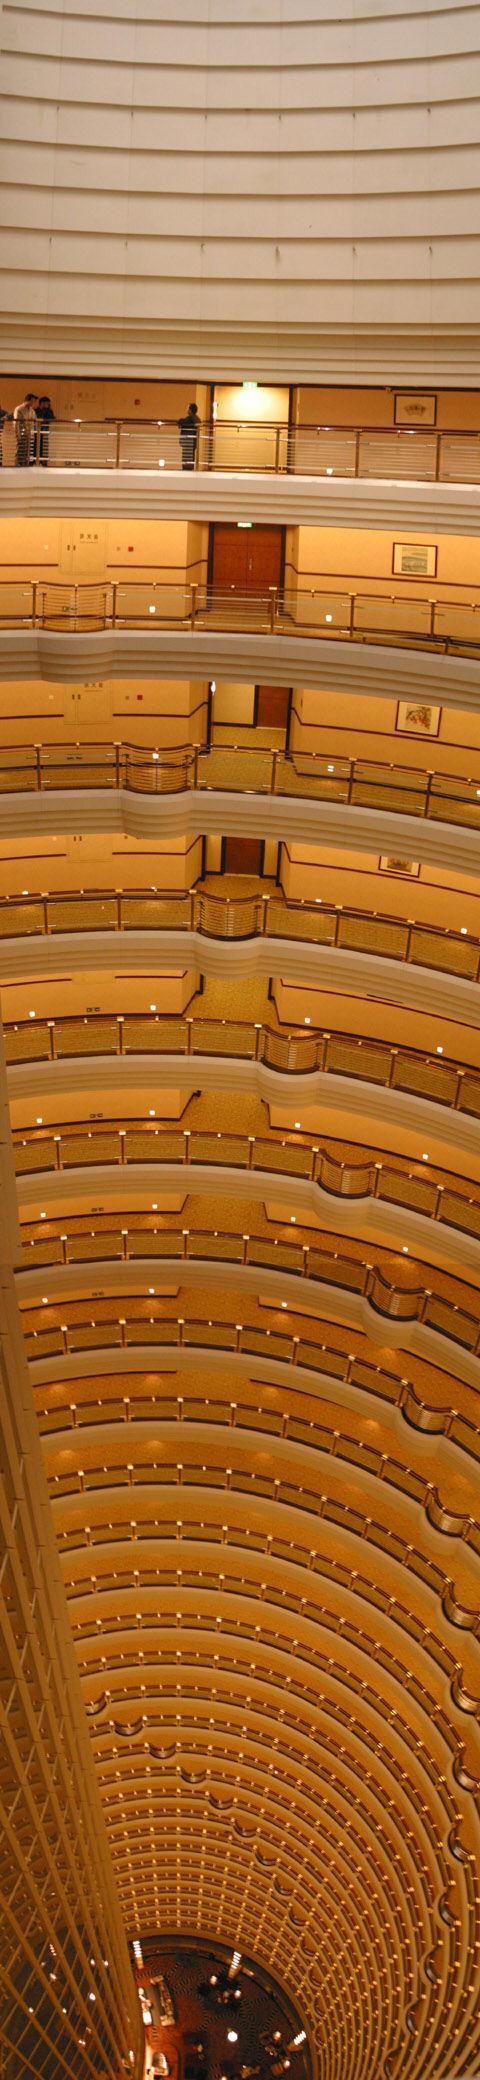 Grand Hyatt Hotel, Jin Mao Tower, Shanghai Architecture